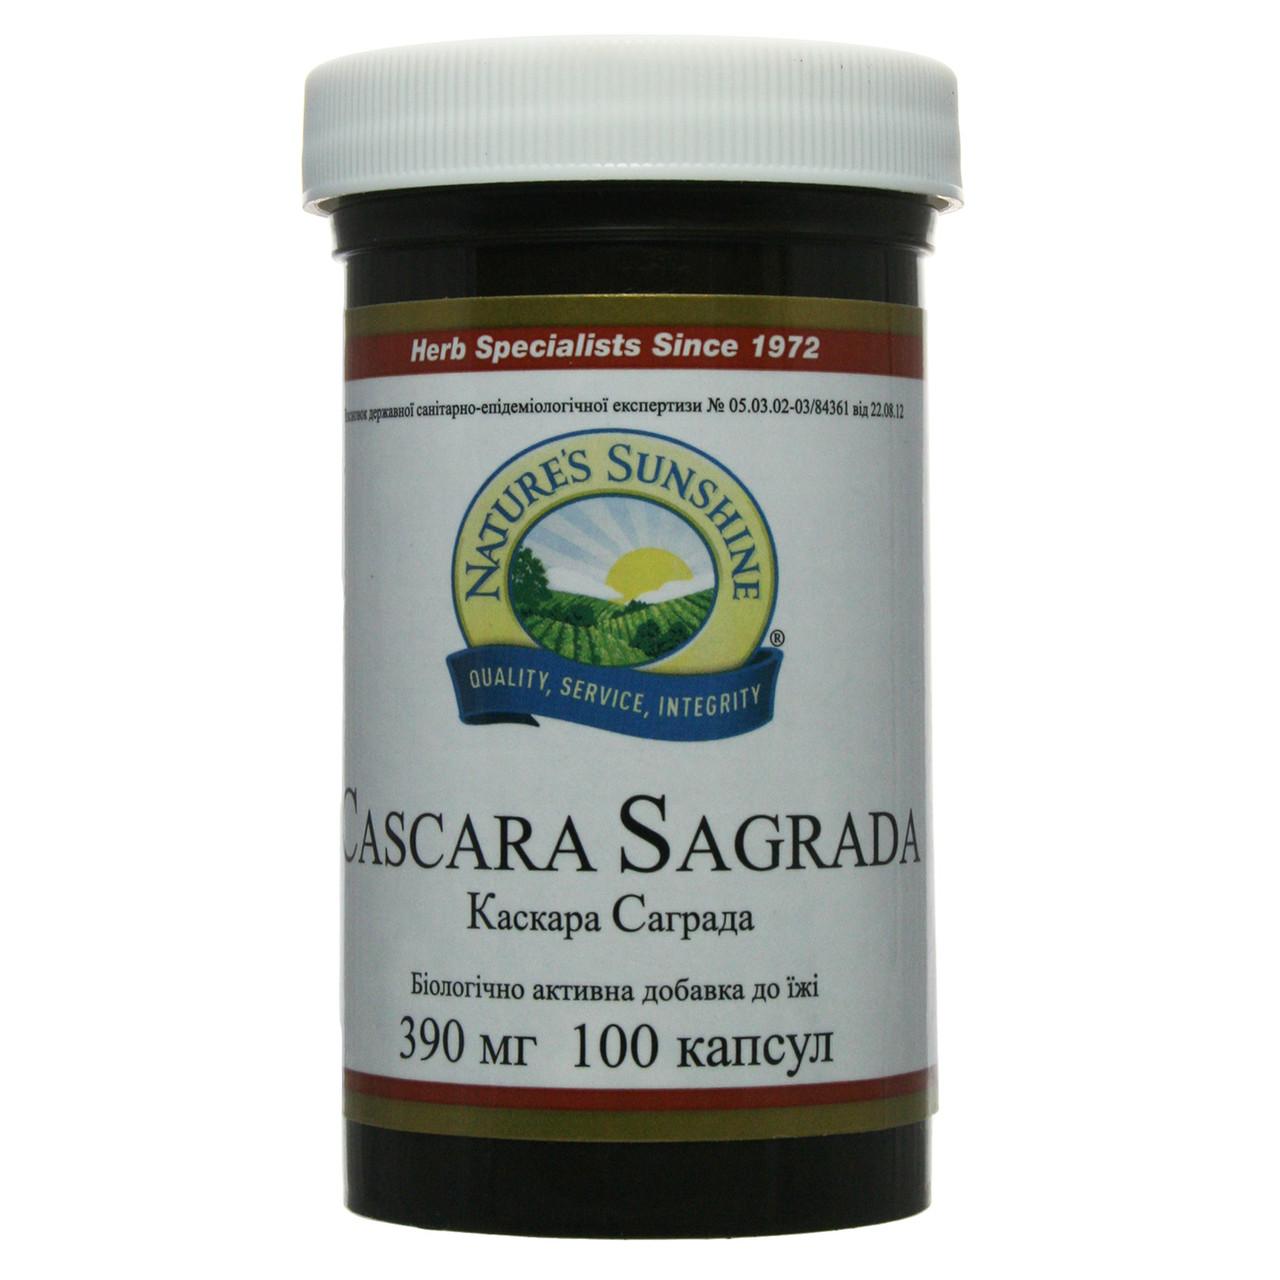 Каскара Саграда при запорах, 390 мг, 100 капсул, Casсara Sagrada, NSP, США